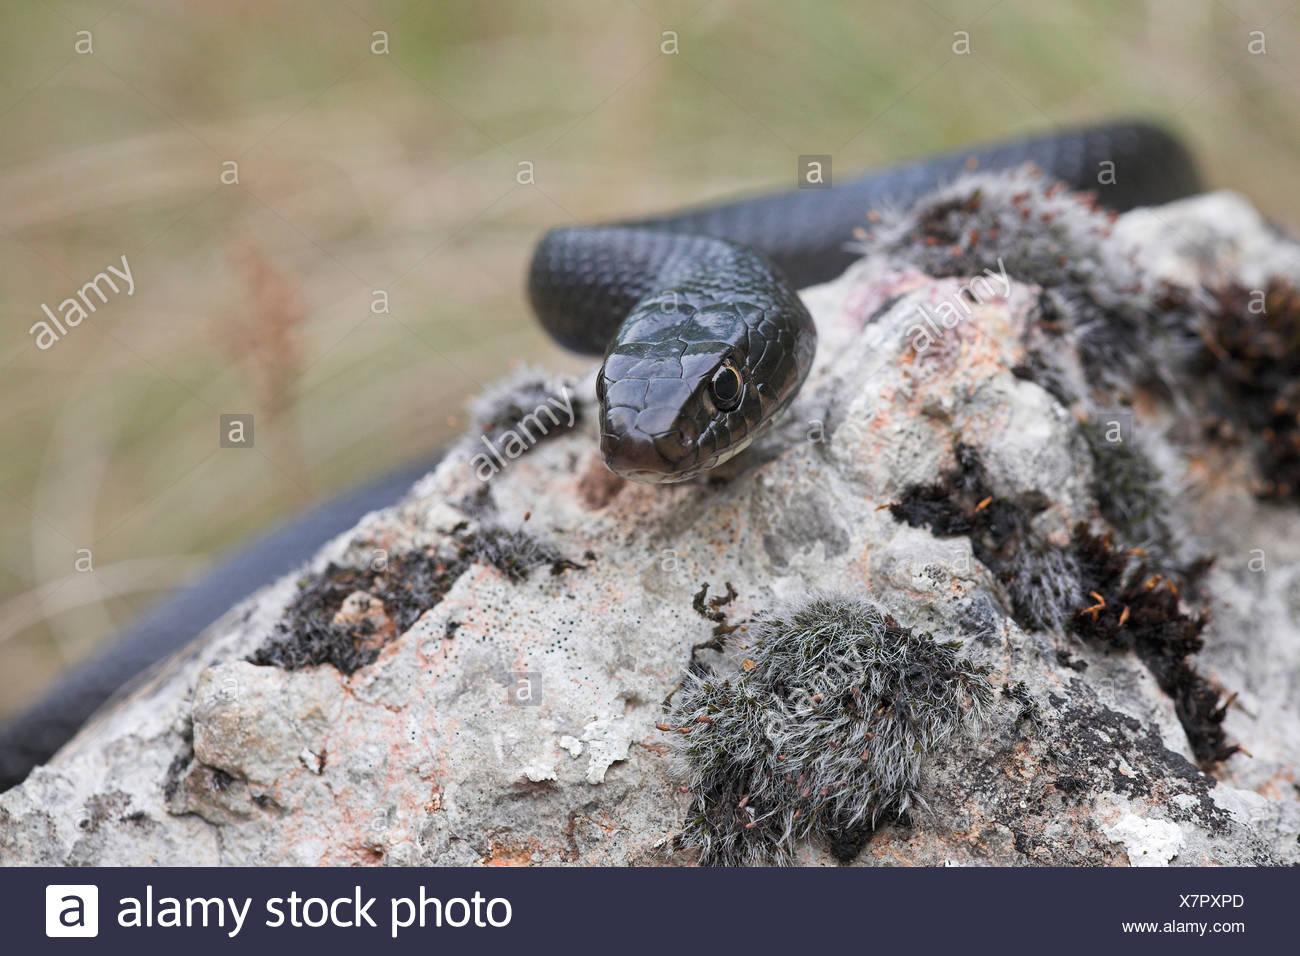 Portret van een zwarte fase Geelgroene toornslang; Portret of a black subspecies of the Western whip snake; - Stock Image